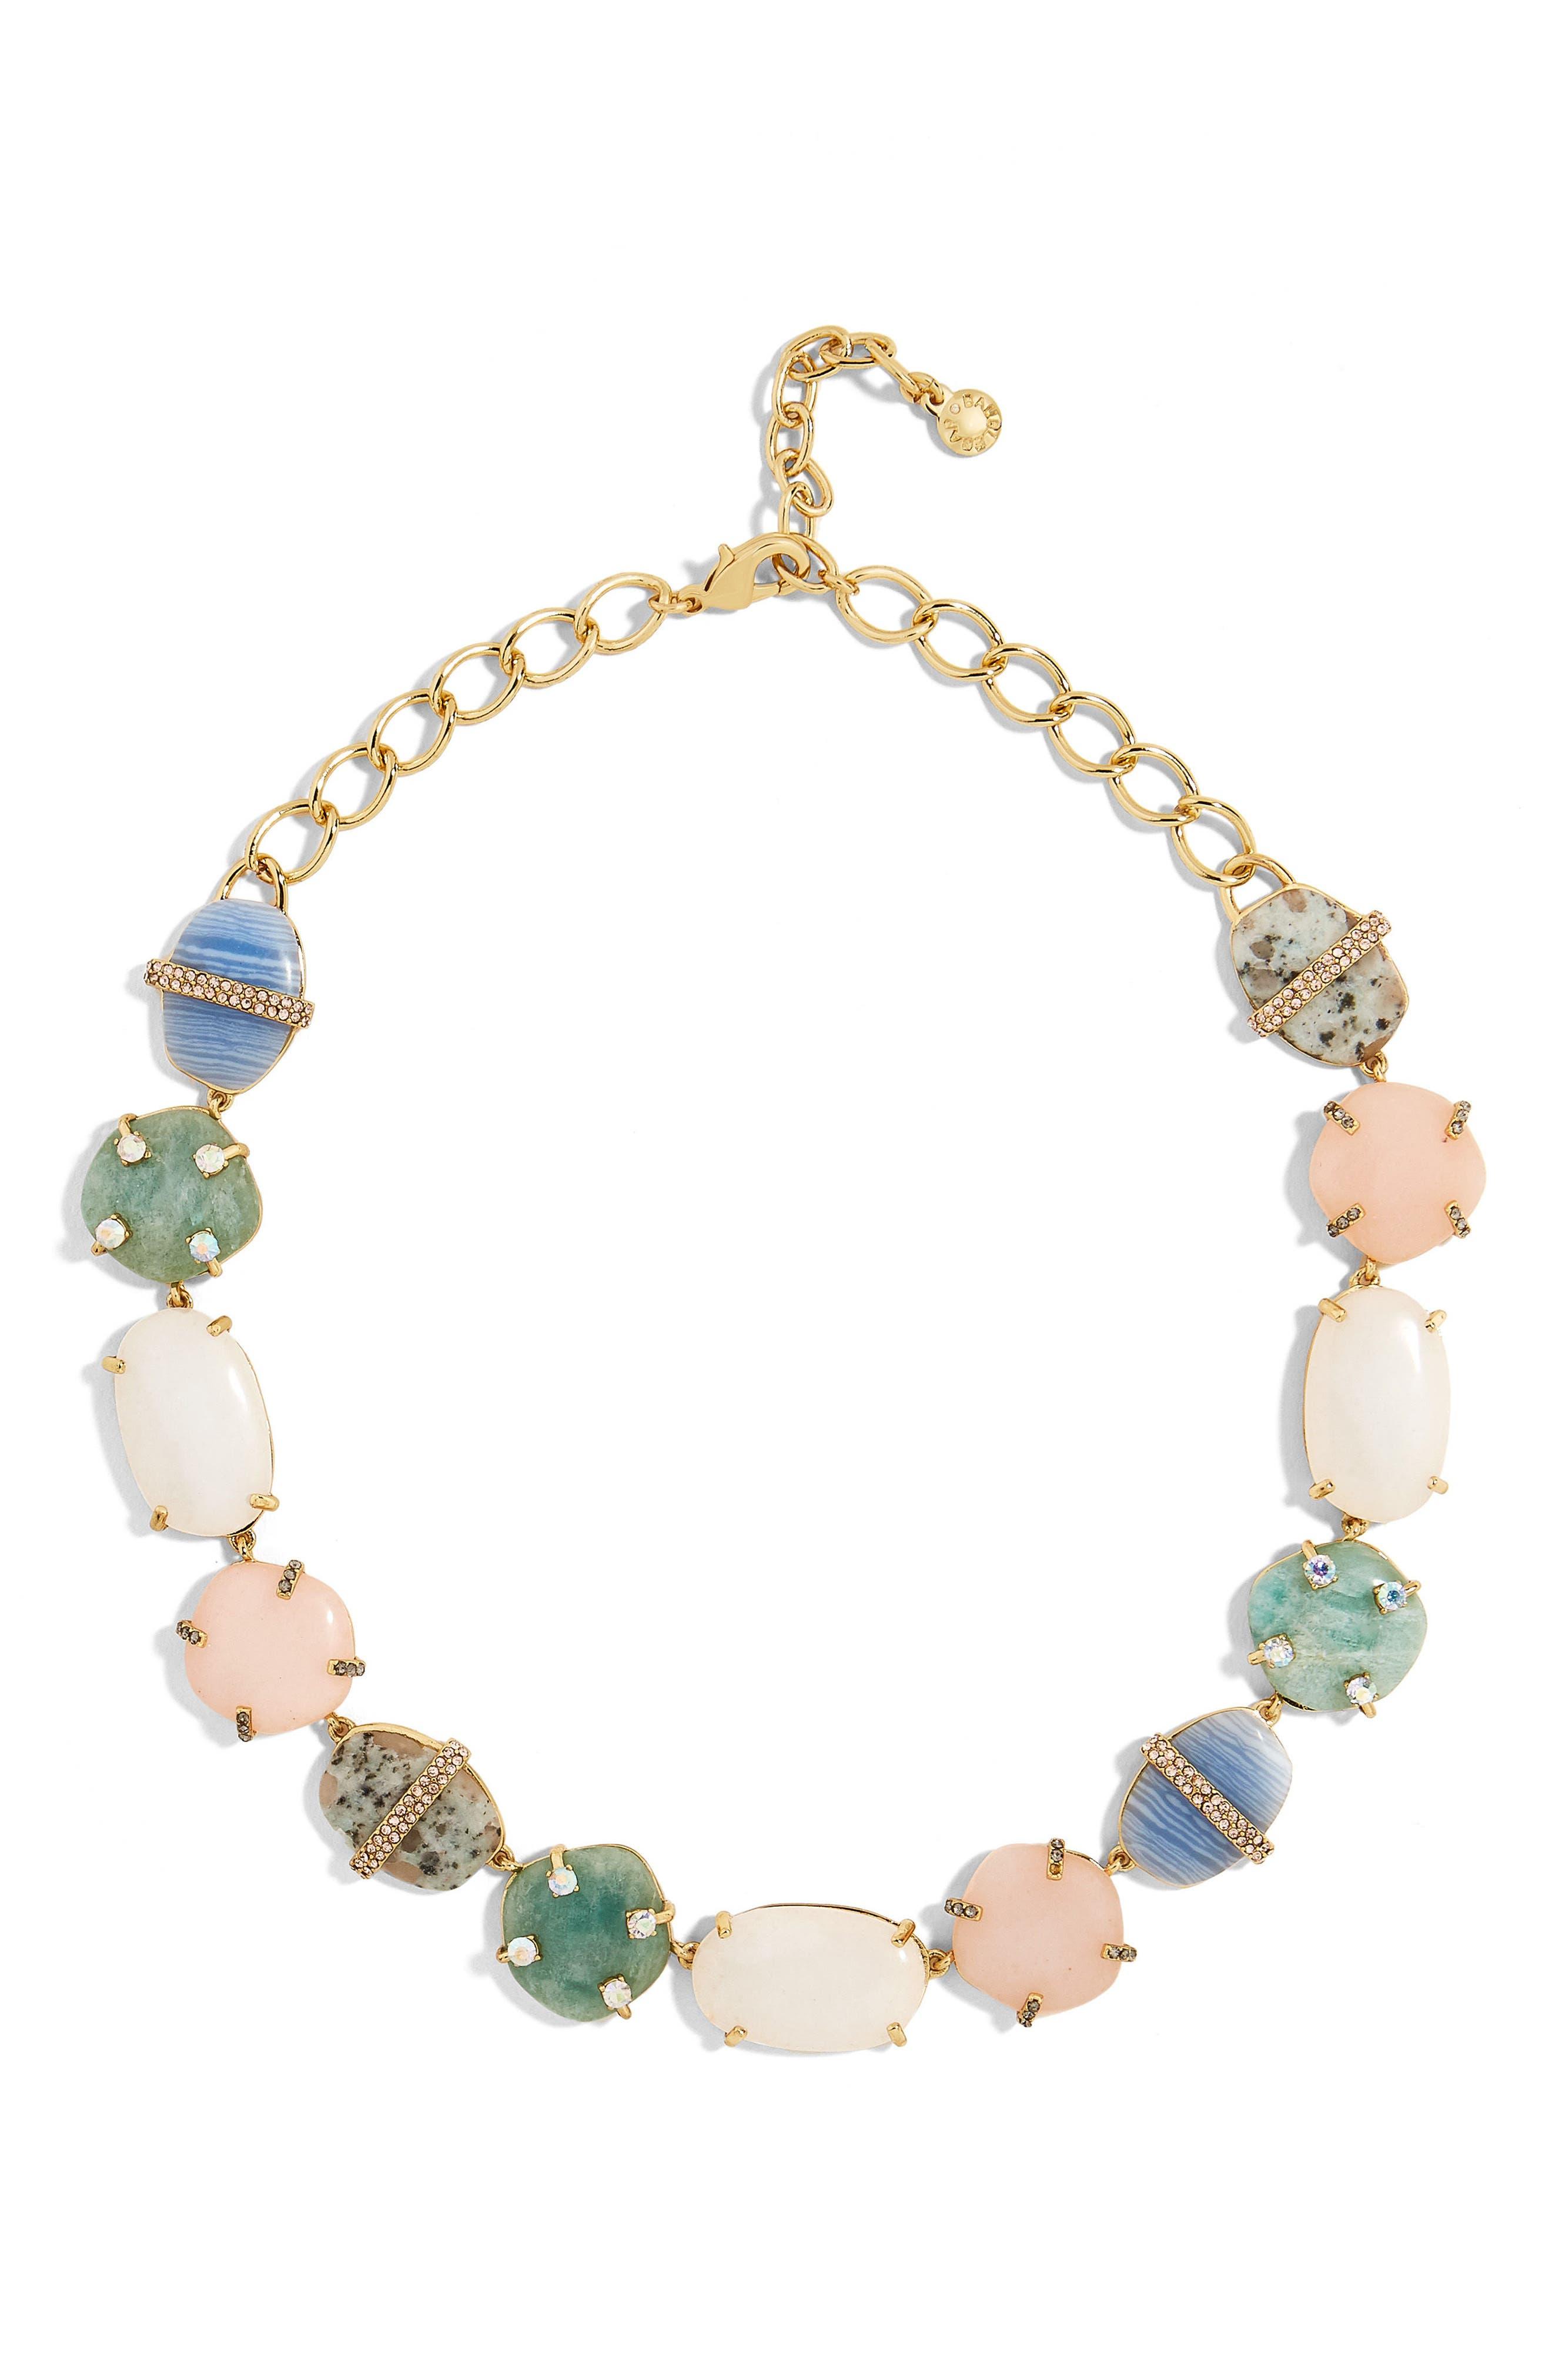 BAUBLEBAR Avianna Collar Necklace